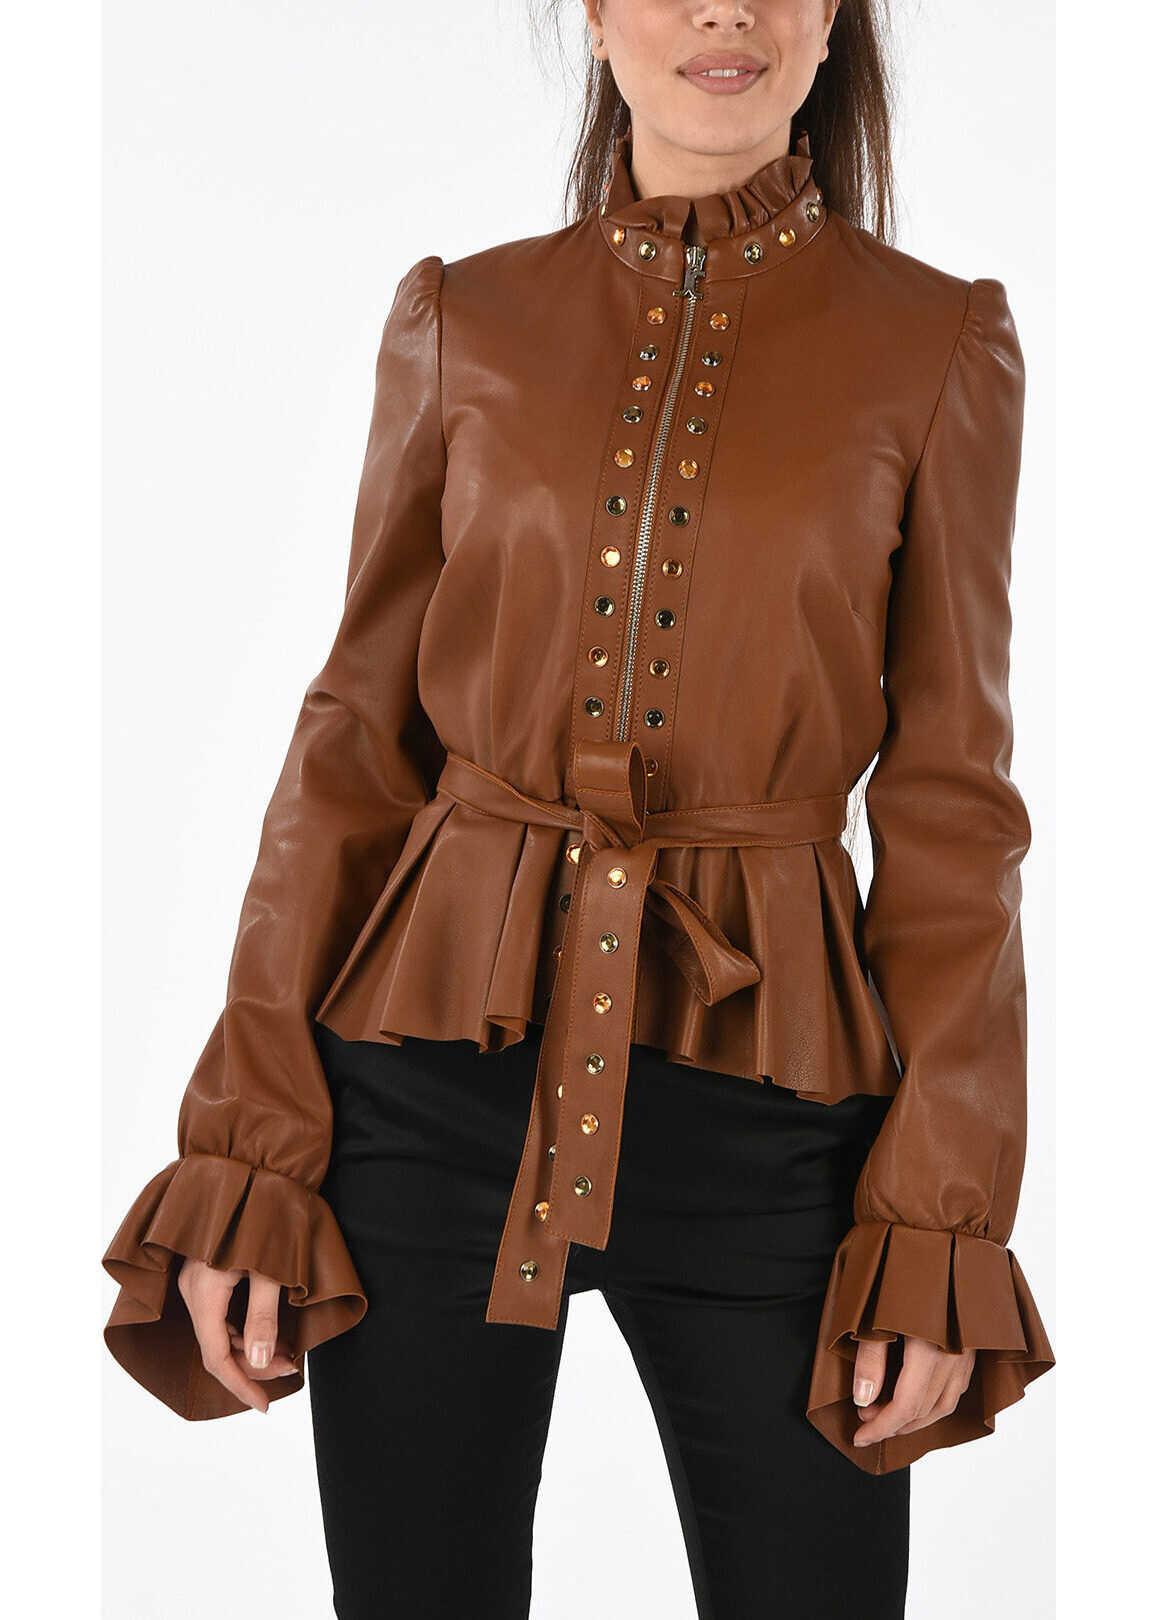 Just Cavalli Embellished Leather Jacket BROWN